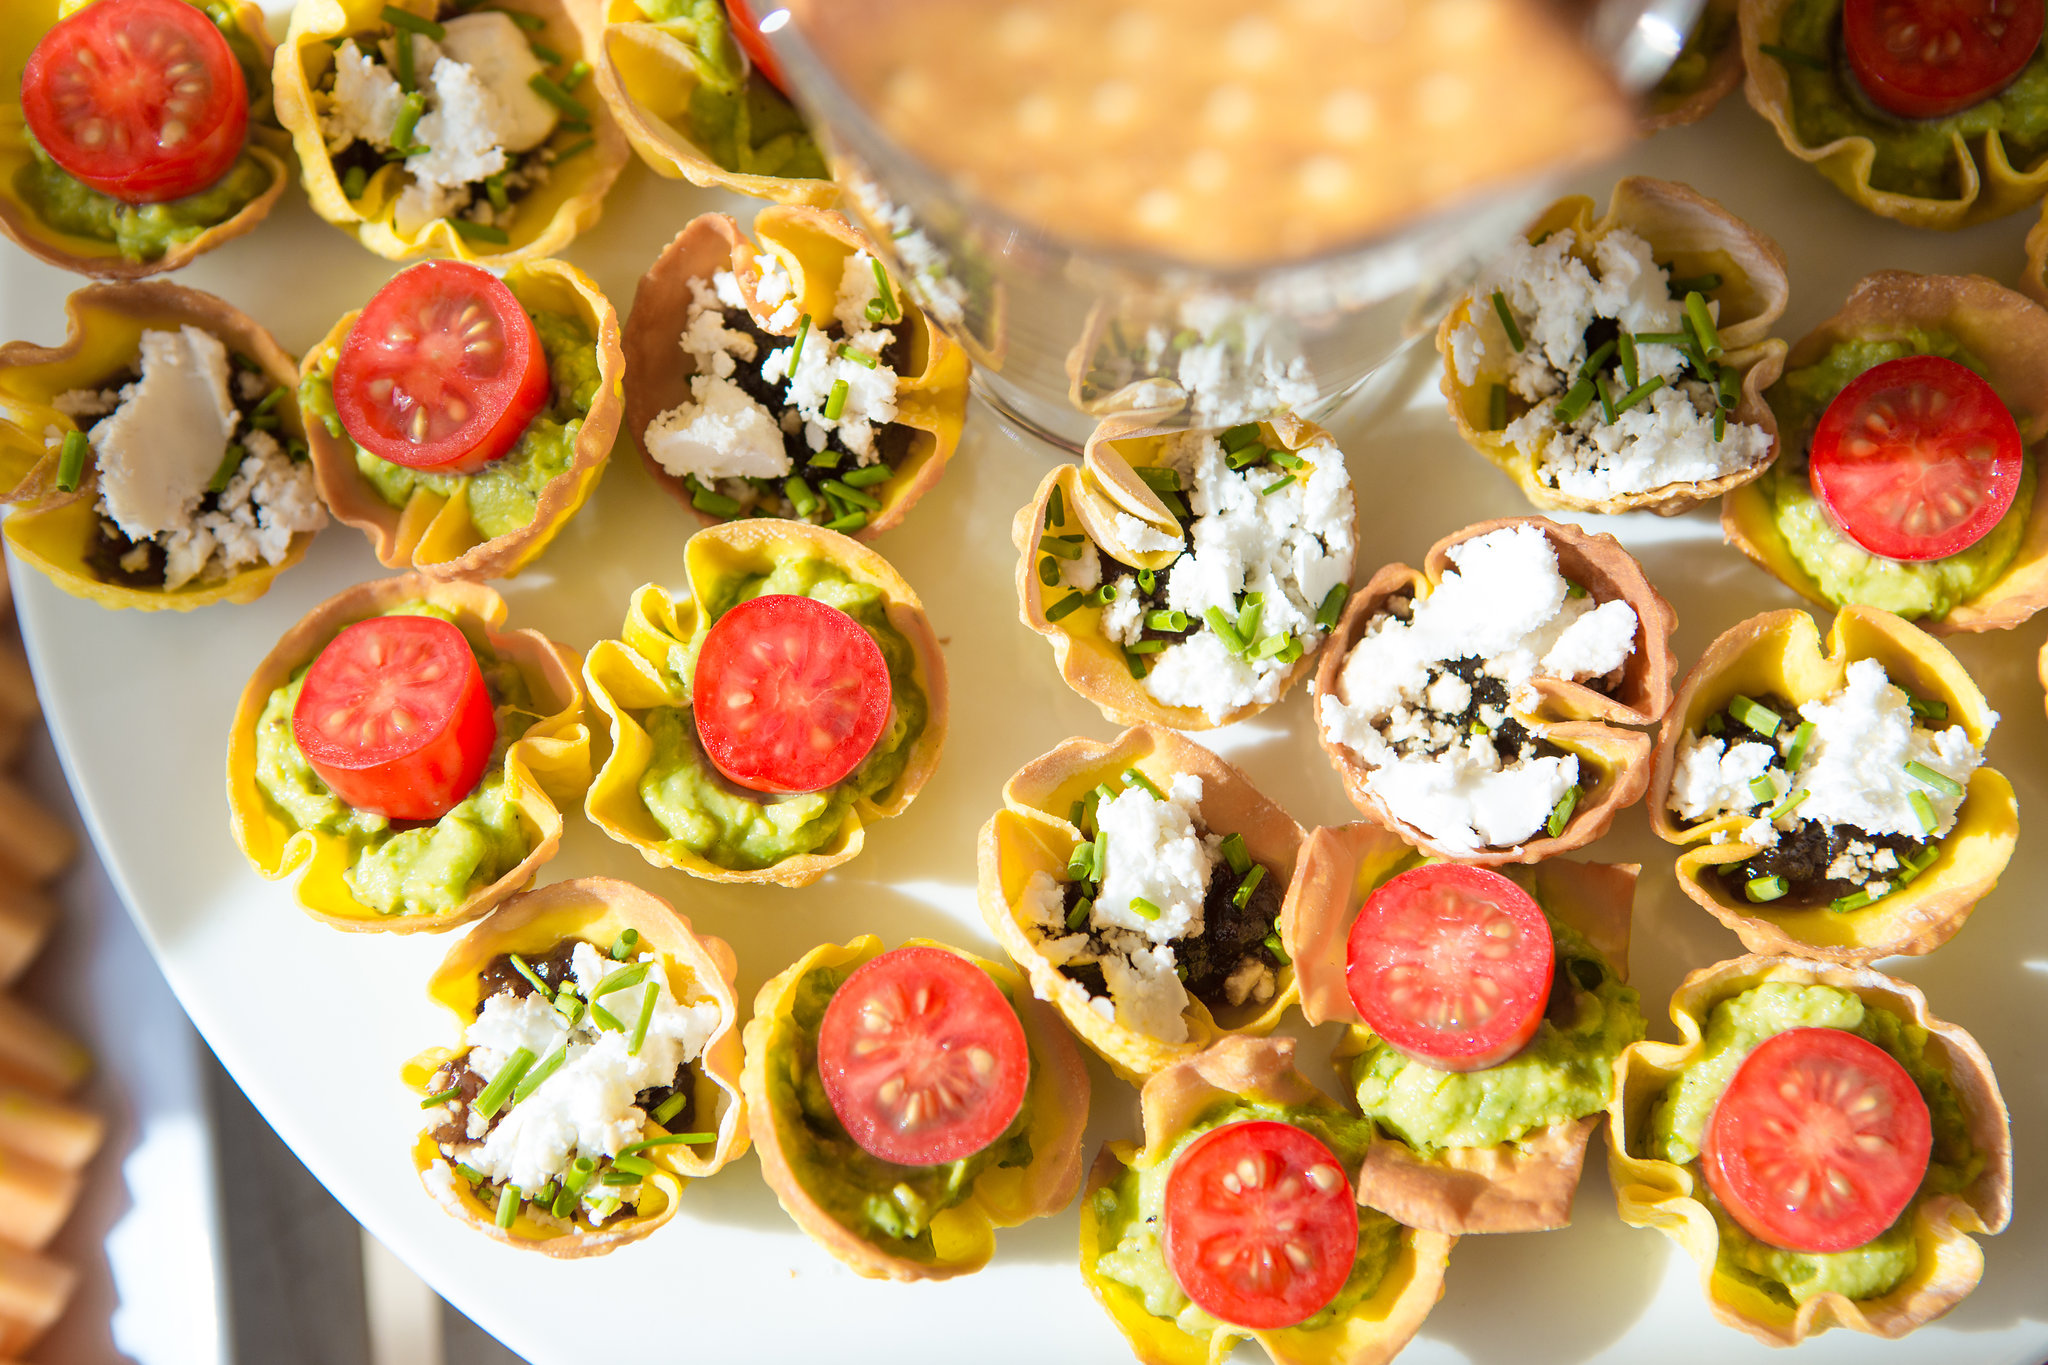 FoodPhotography-CollaborativeSession-JenniferLamPhotography(3)